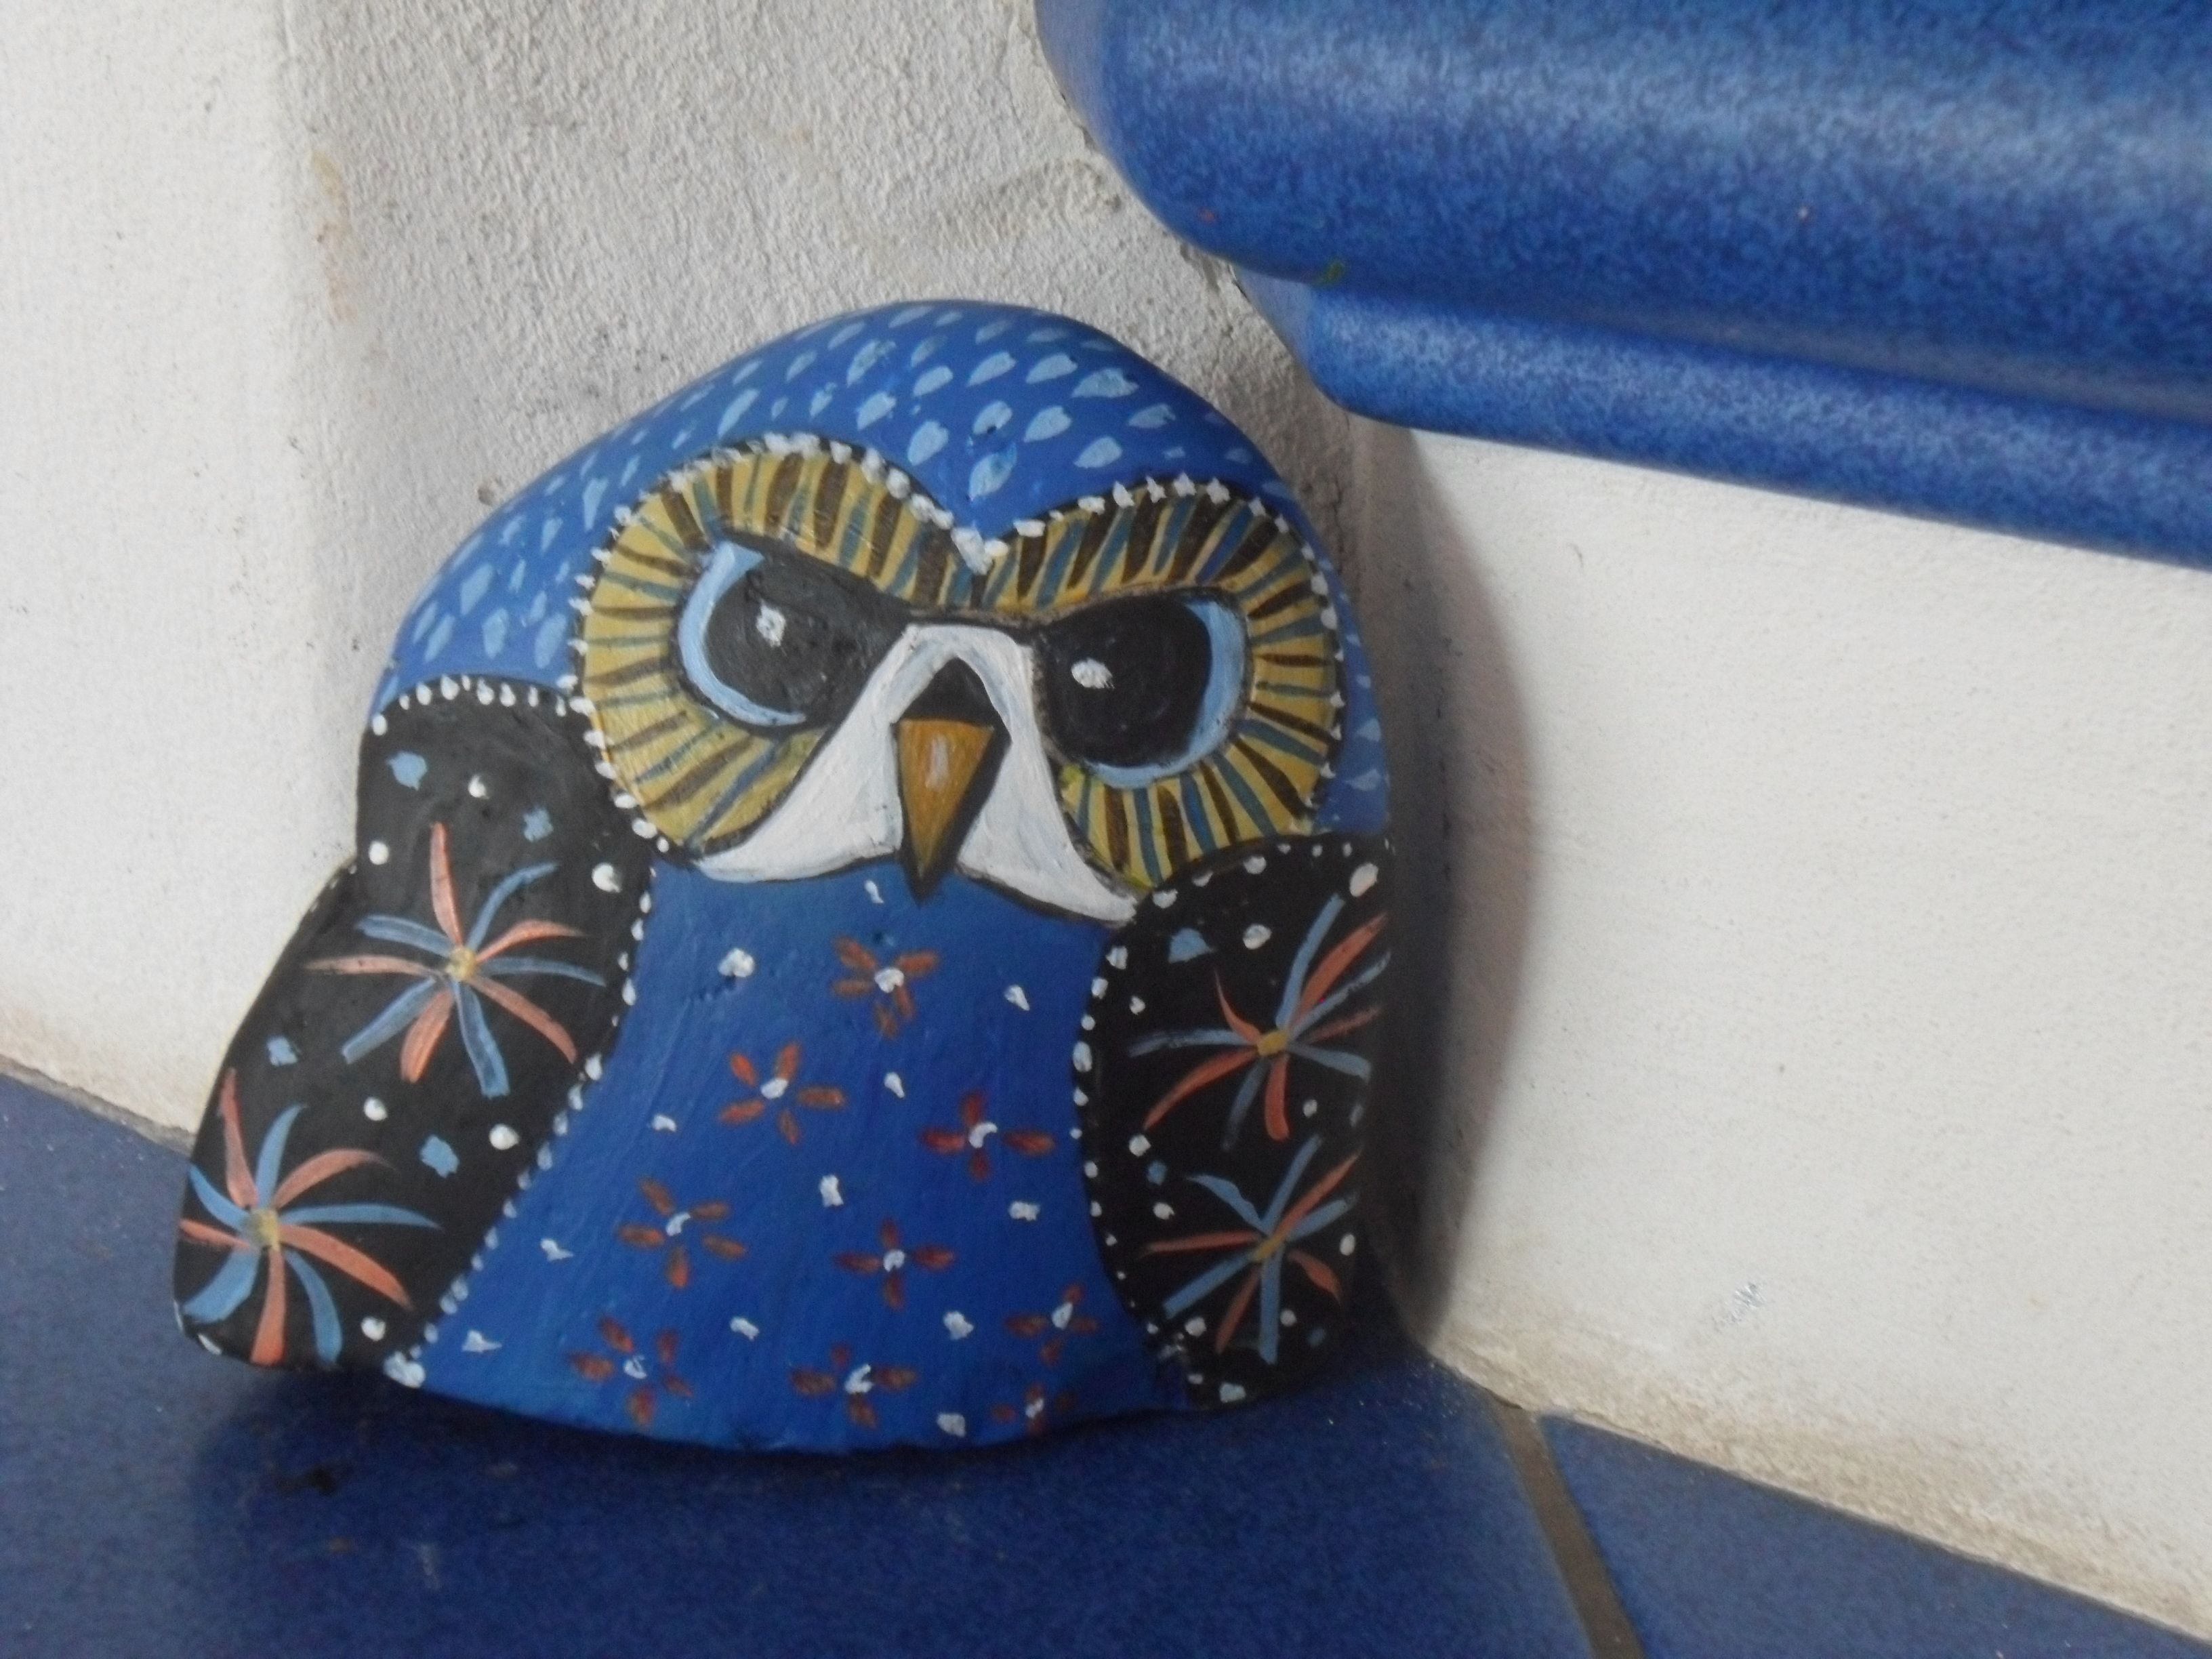 eule bematler stein bei ebay painted stones pebble art pinterest steine bemalen steine. Black Bedroom Furniture Sets. Home Design Ideas